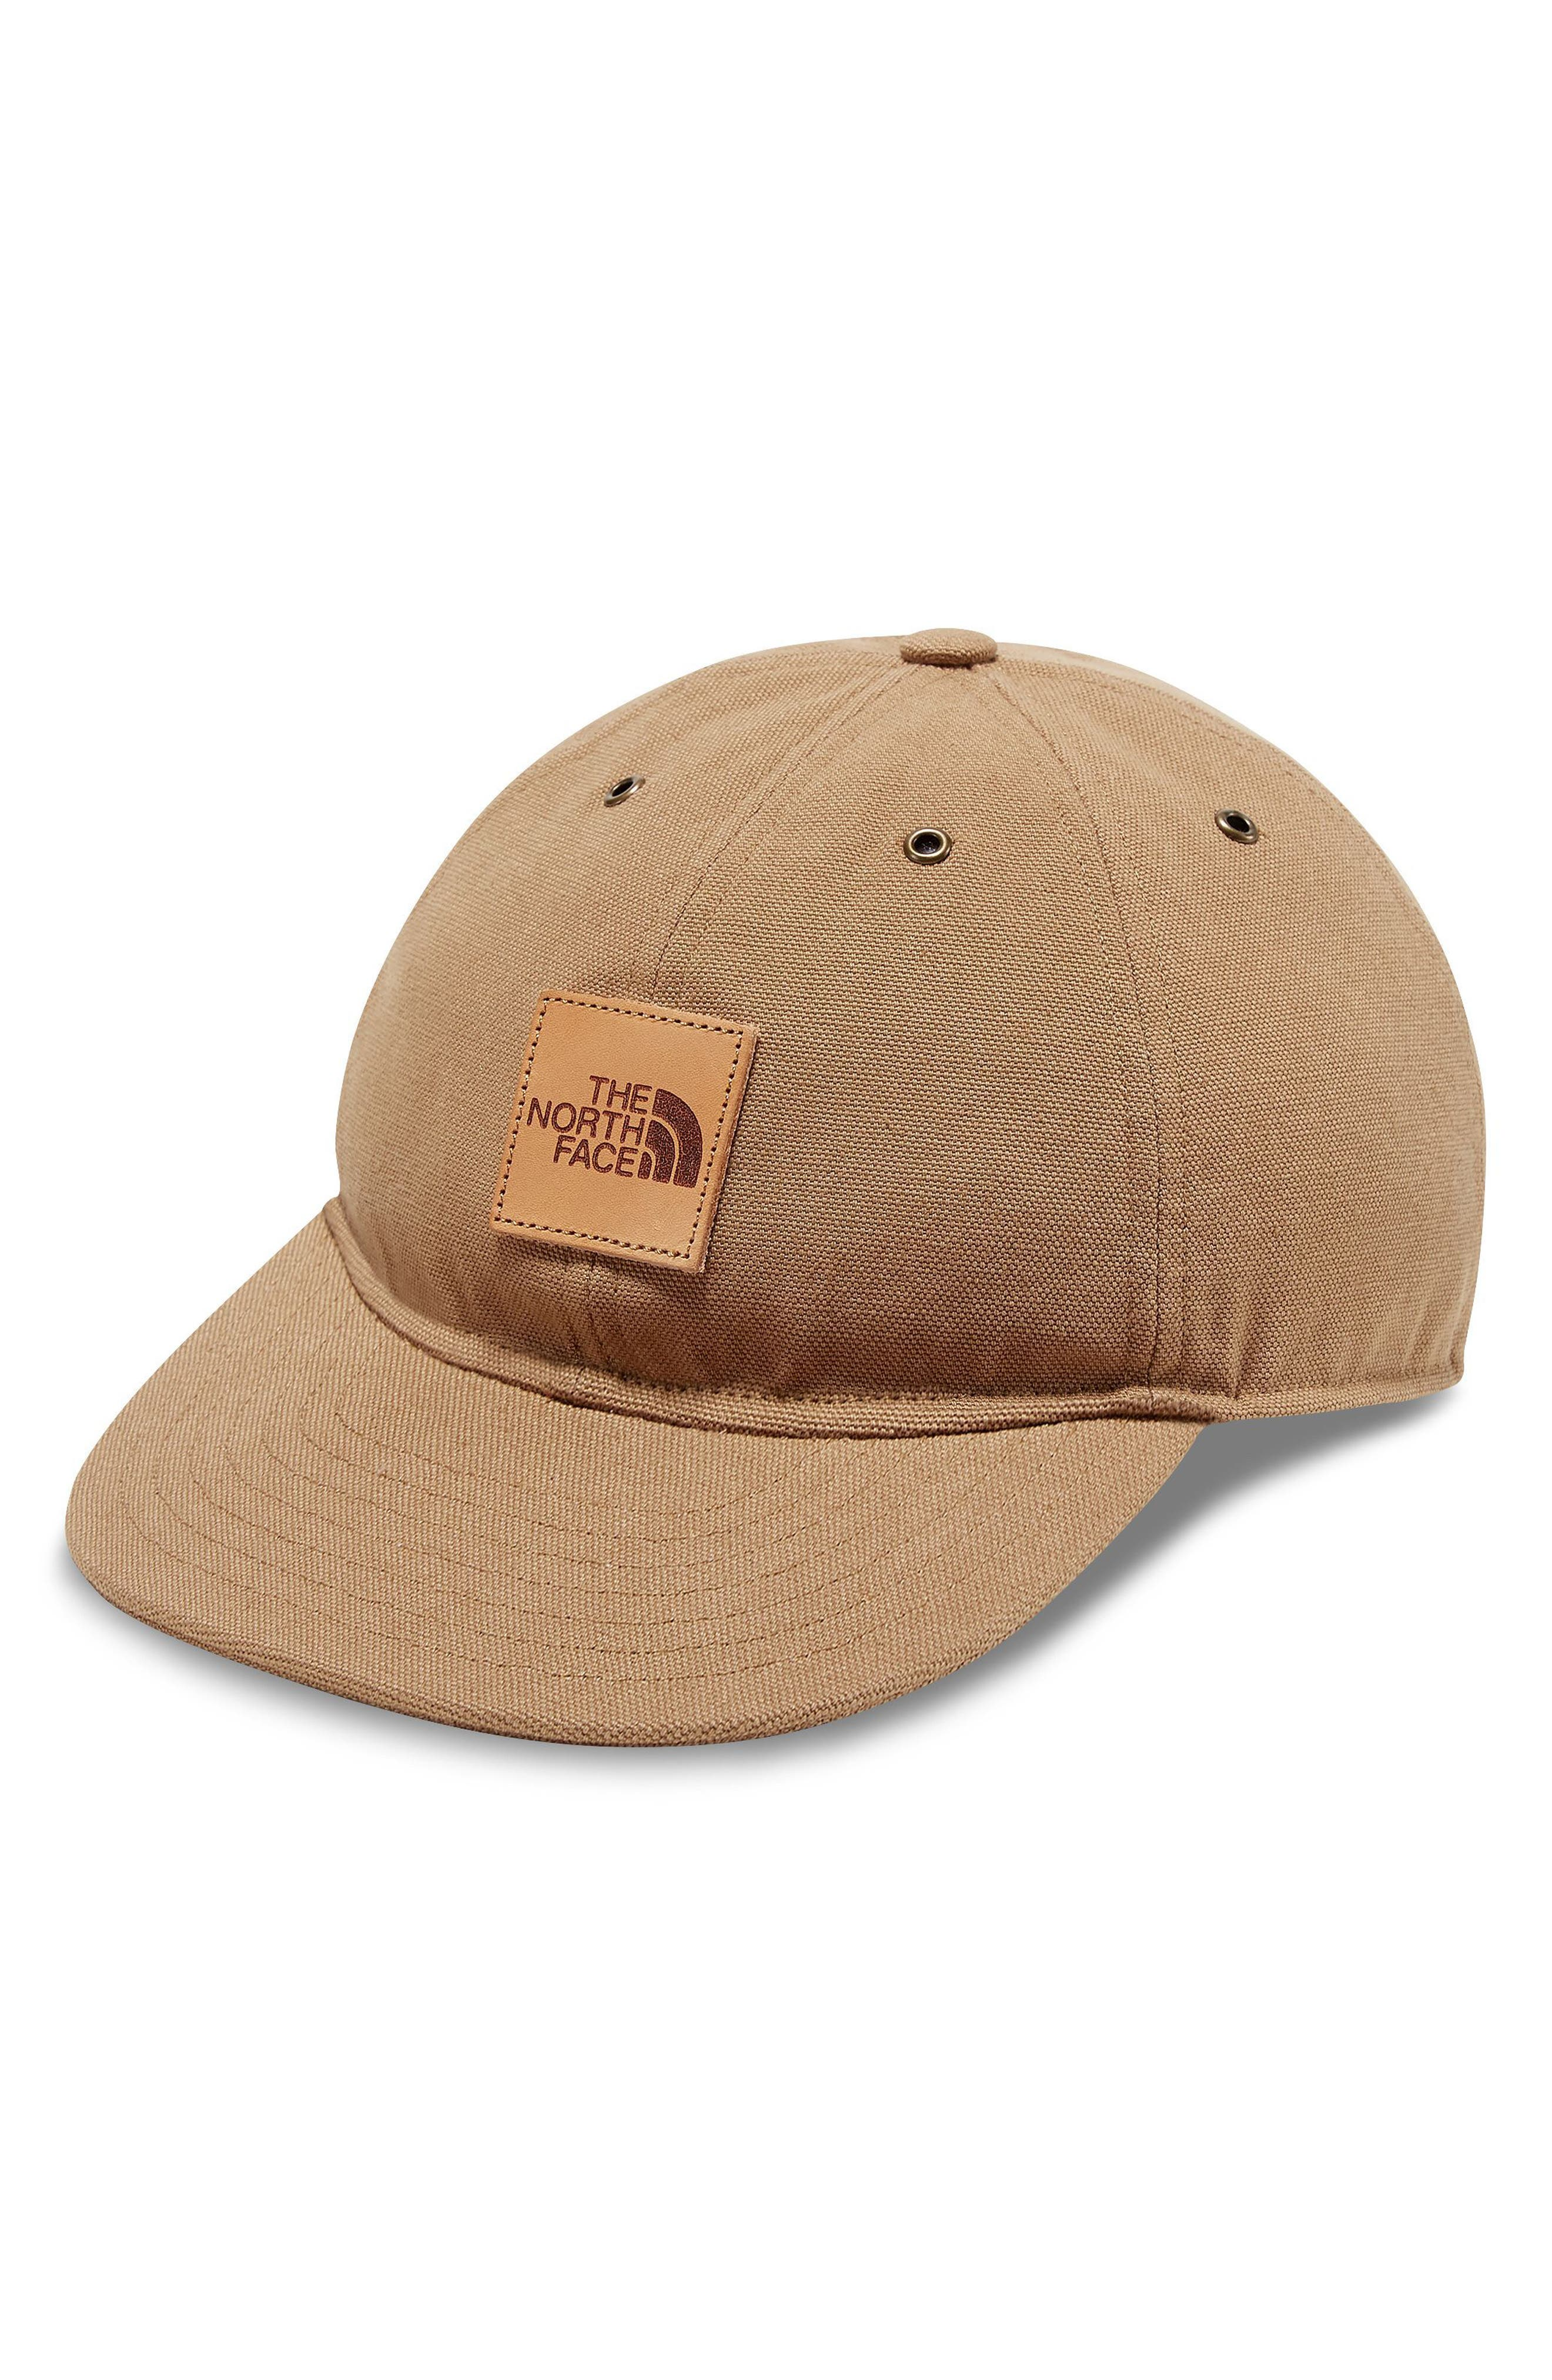 Naturalist Cap,                         Main,                         color, Cargo Khaki